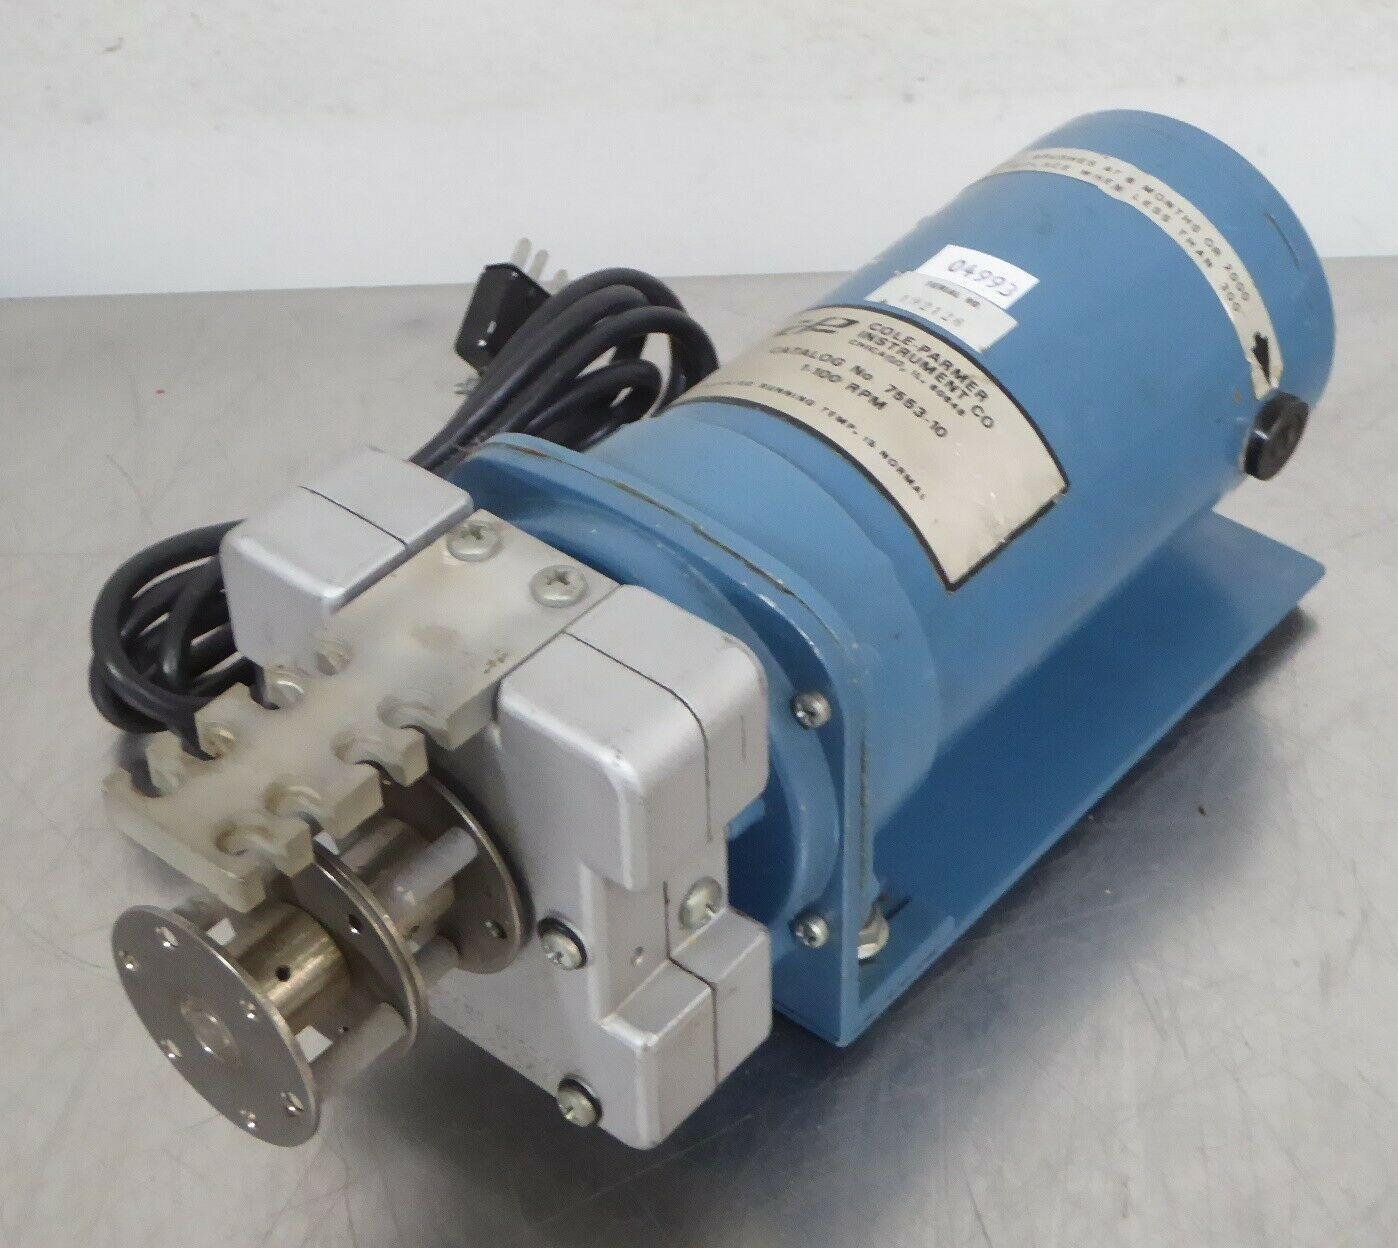 T166362 Cole Parmer 7553-10 Pump Drive Motor w/ He